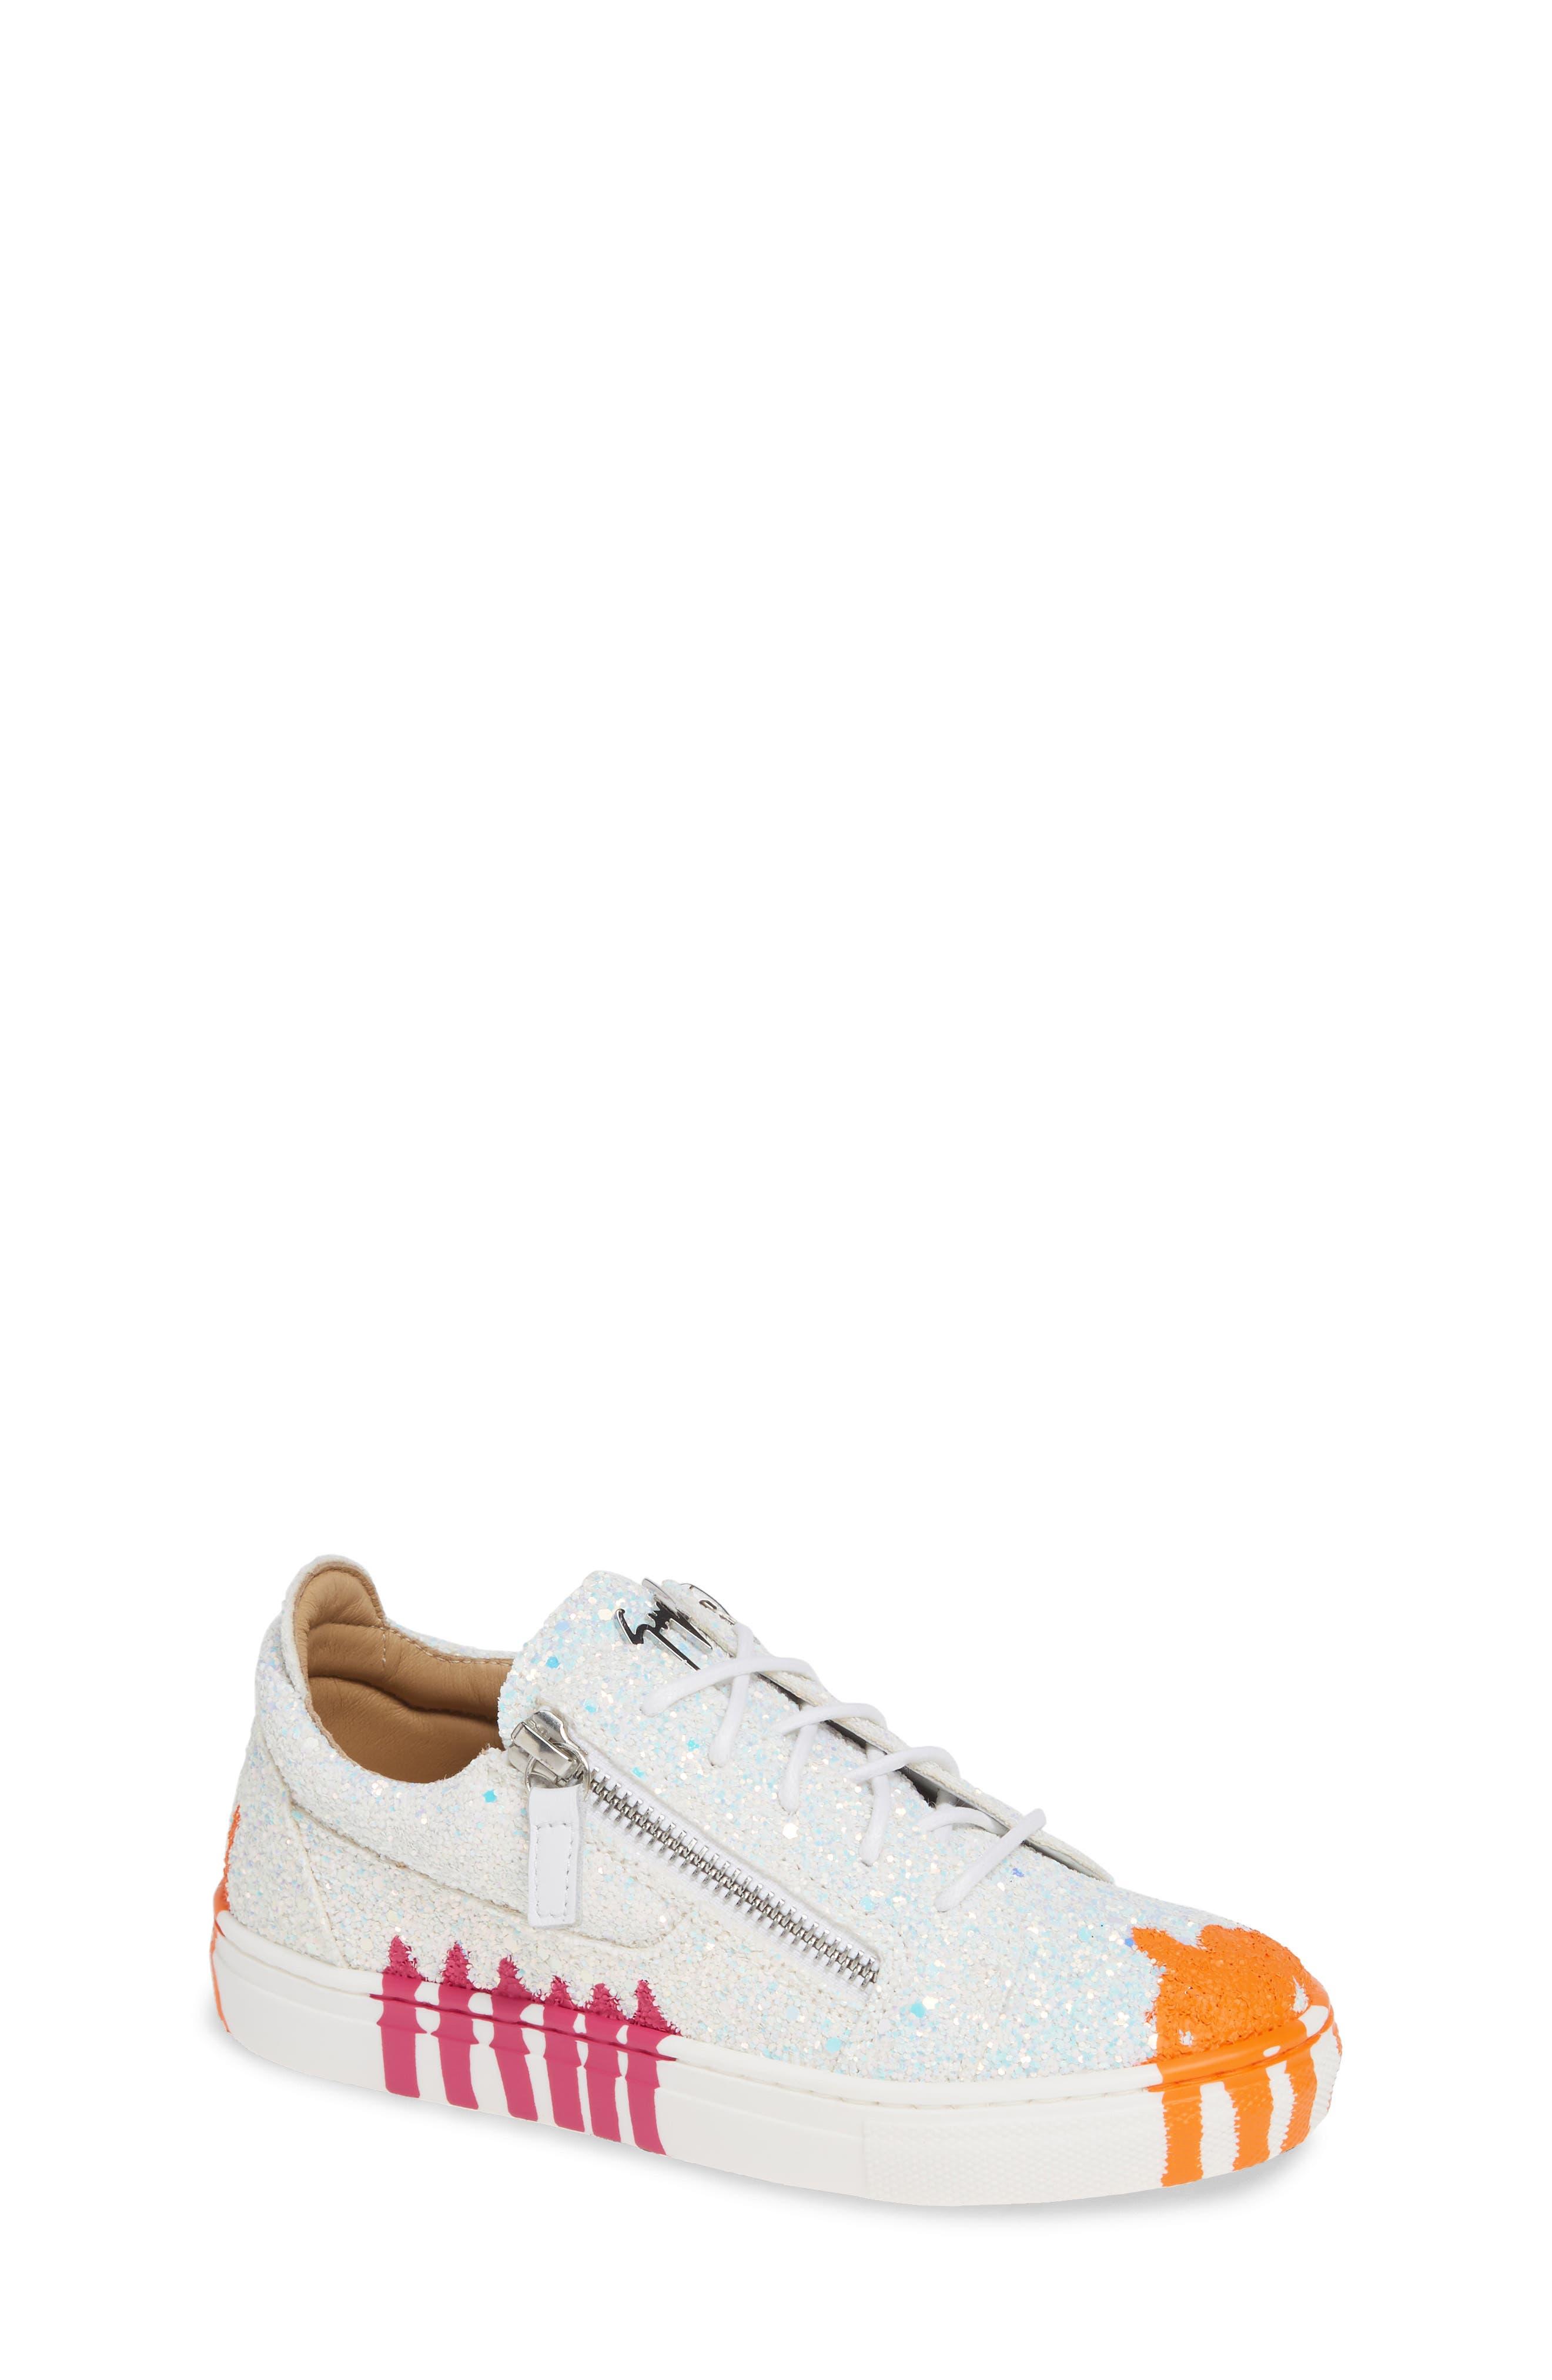 GIUSEPPE ZANOTTI,                             London Glitter Sneaker,                             Main thumbnail 1, color,                             MILK